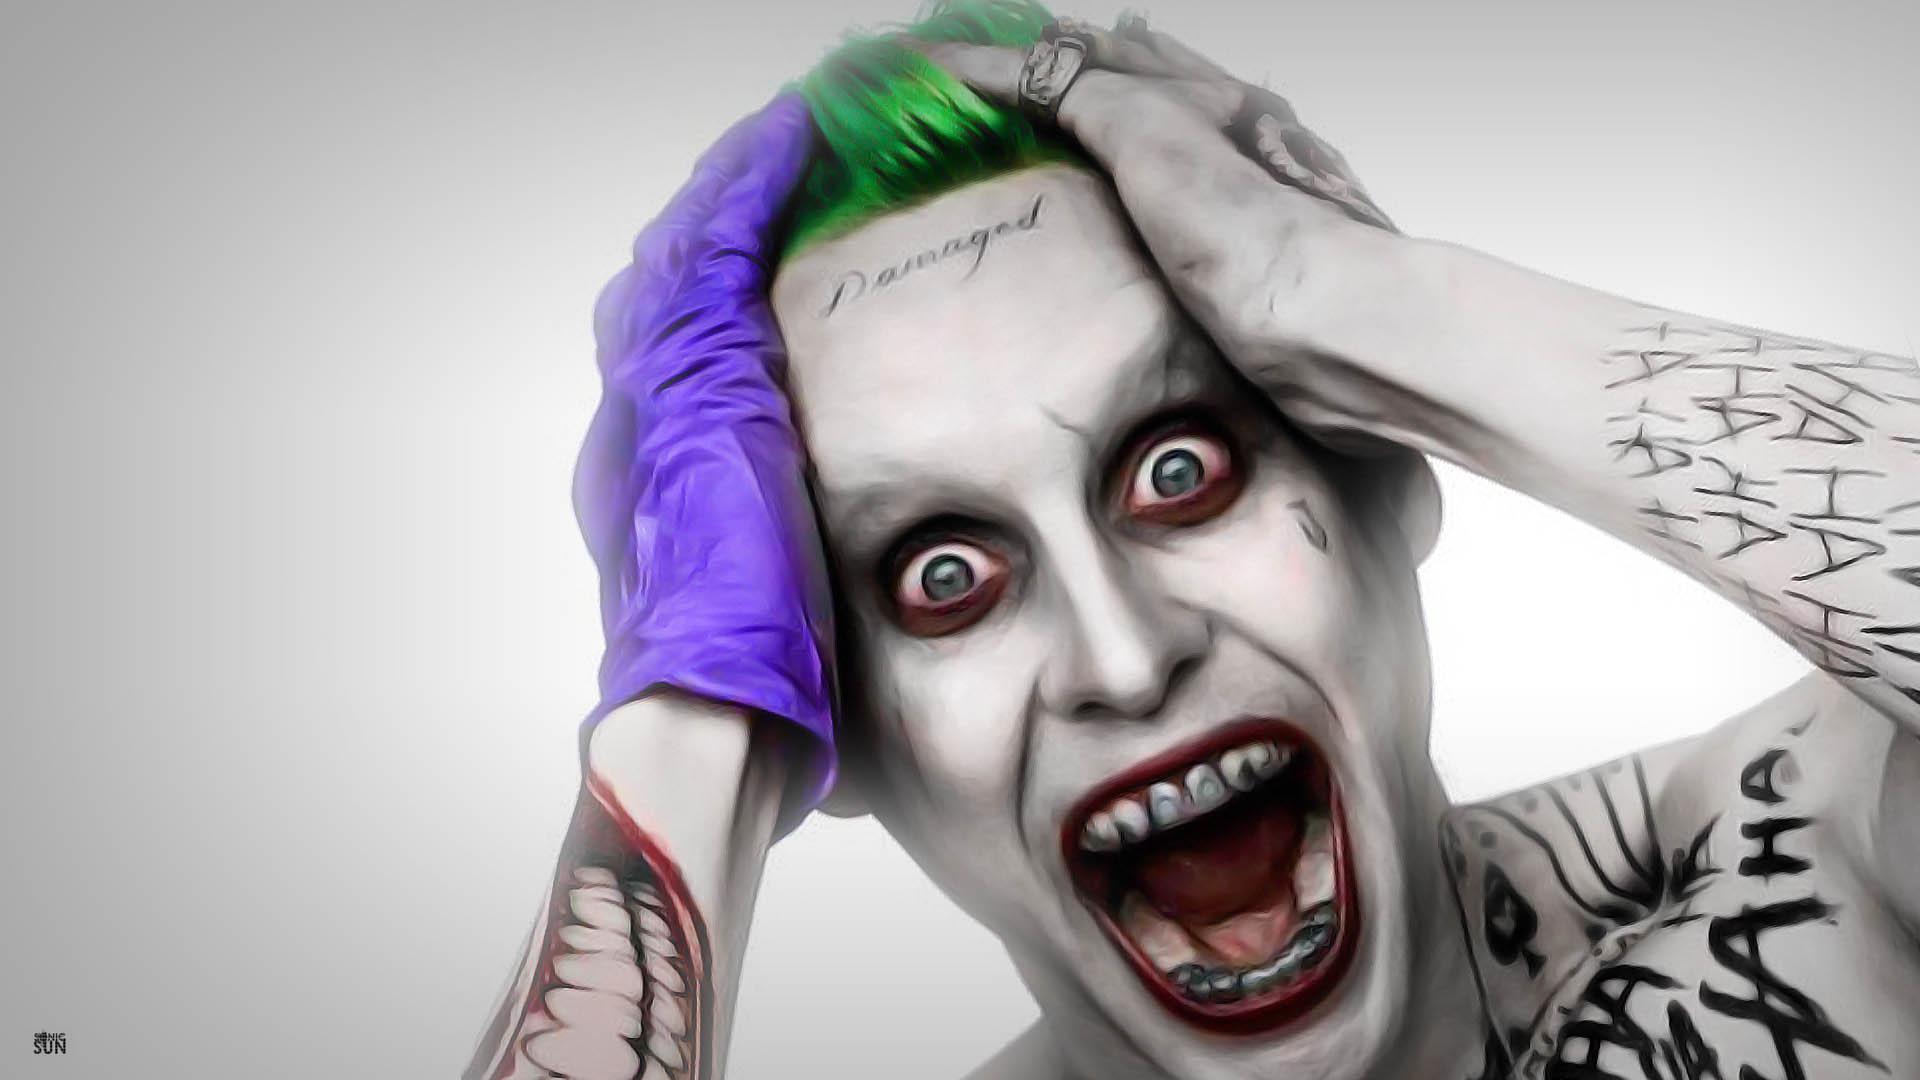 Jared leto images jared leto hd wallpaper and background photos -  Leto Joker Finally Unveiled Joker Joker Suicide Squad Jared